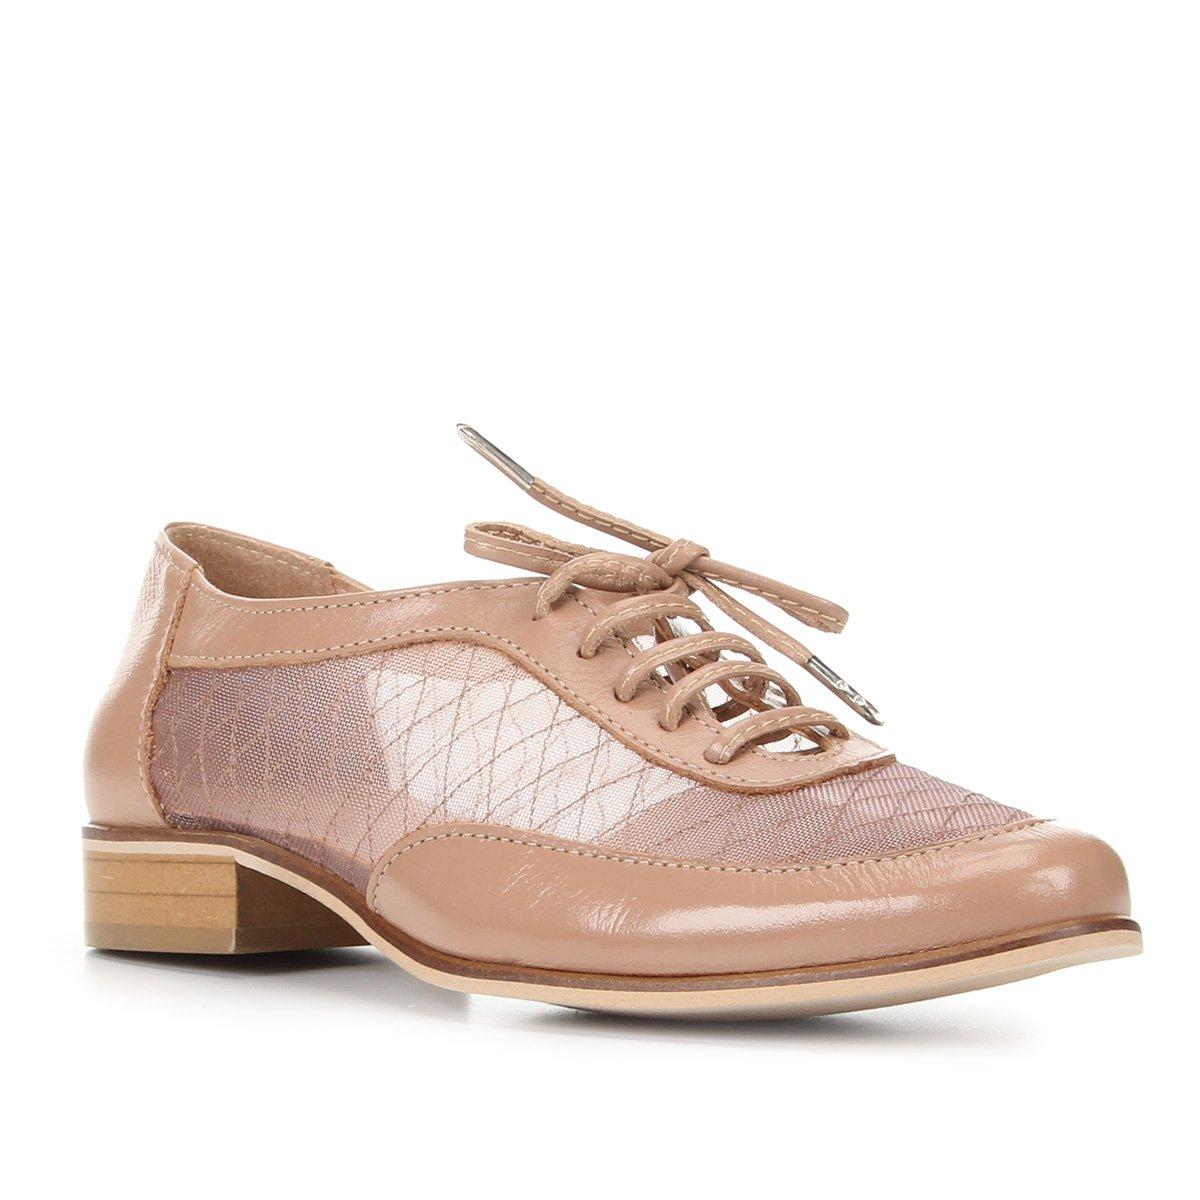 Oxford Couro Shoestock Tela Bordada Feminino